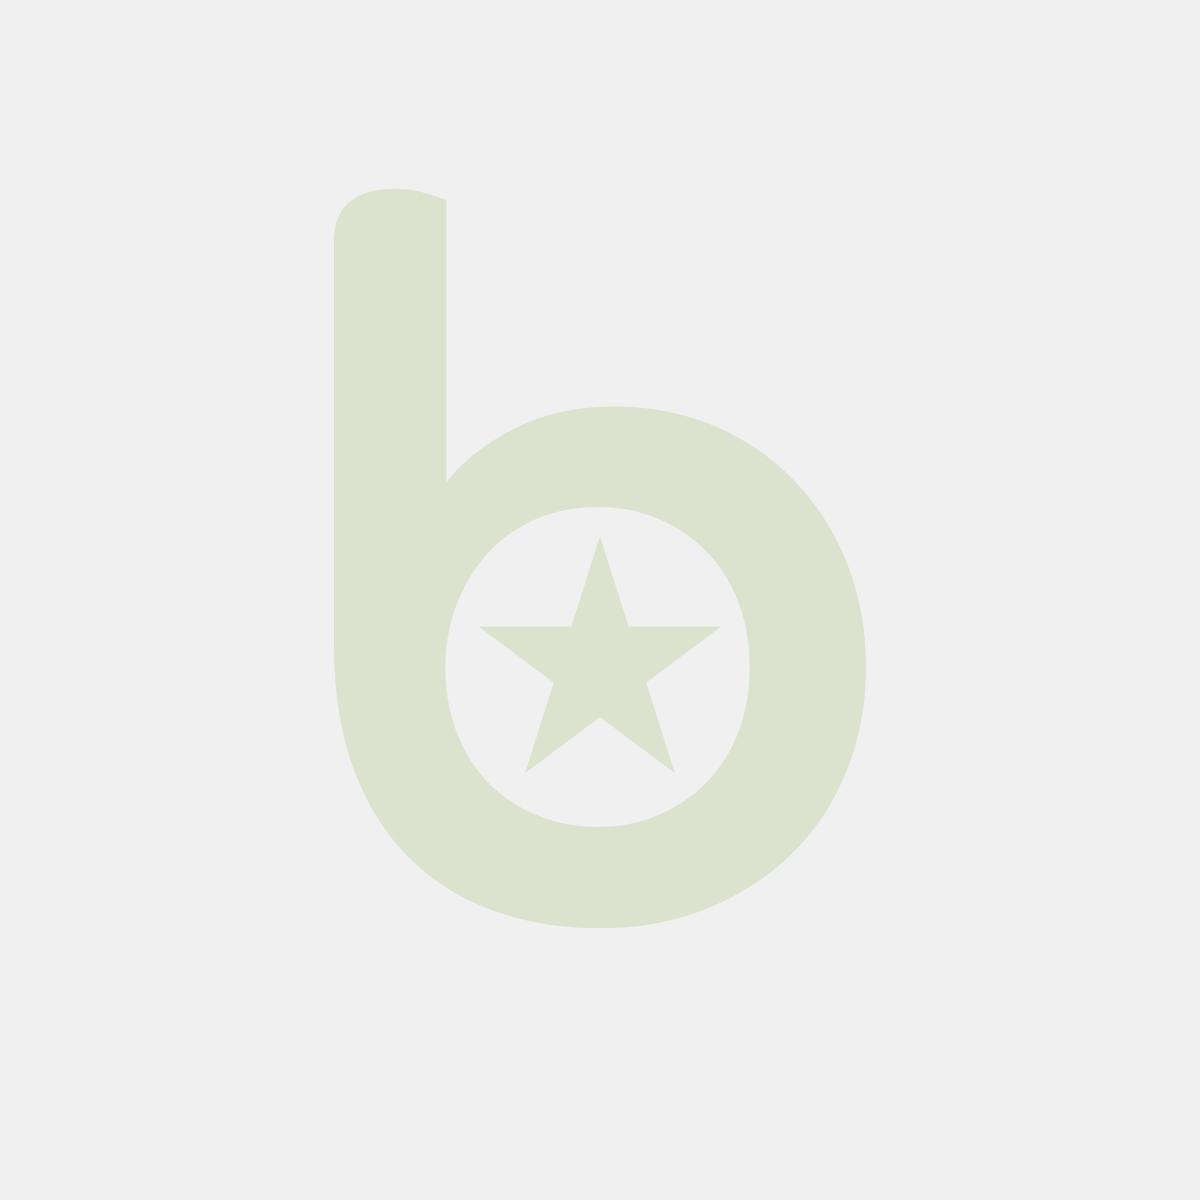 Serwetki 38x38 2W PUNTA FATO czarne FATO Star, op. 40 sztuk